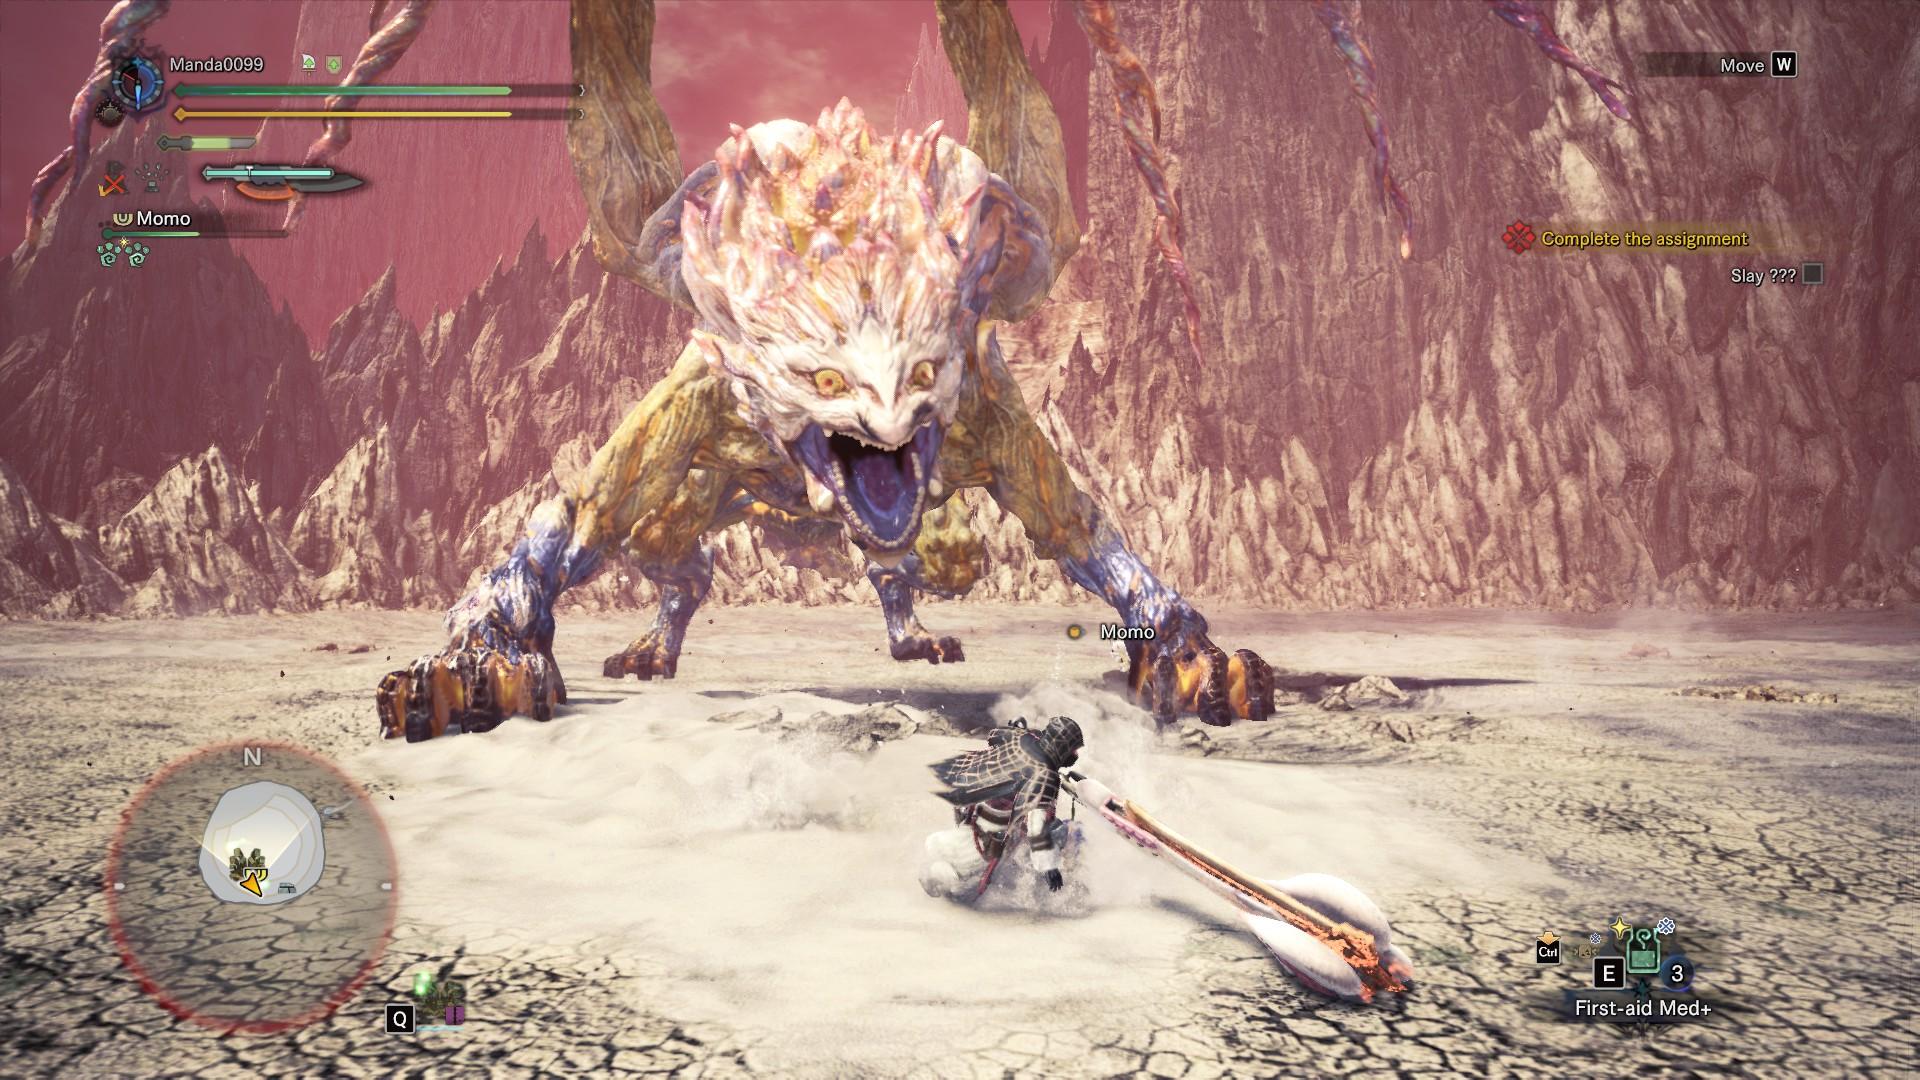 Monster Hunter: World - Tips How to Defeat Shara Ishvalda - Some tips to fight Shara Ishvalda... - 7E74B96